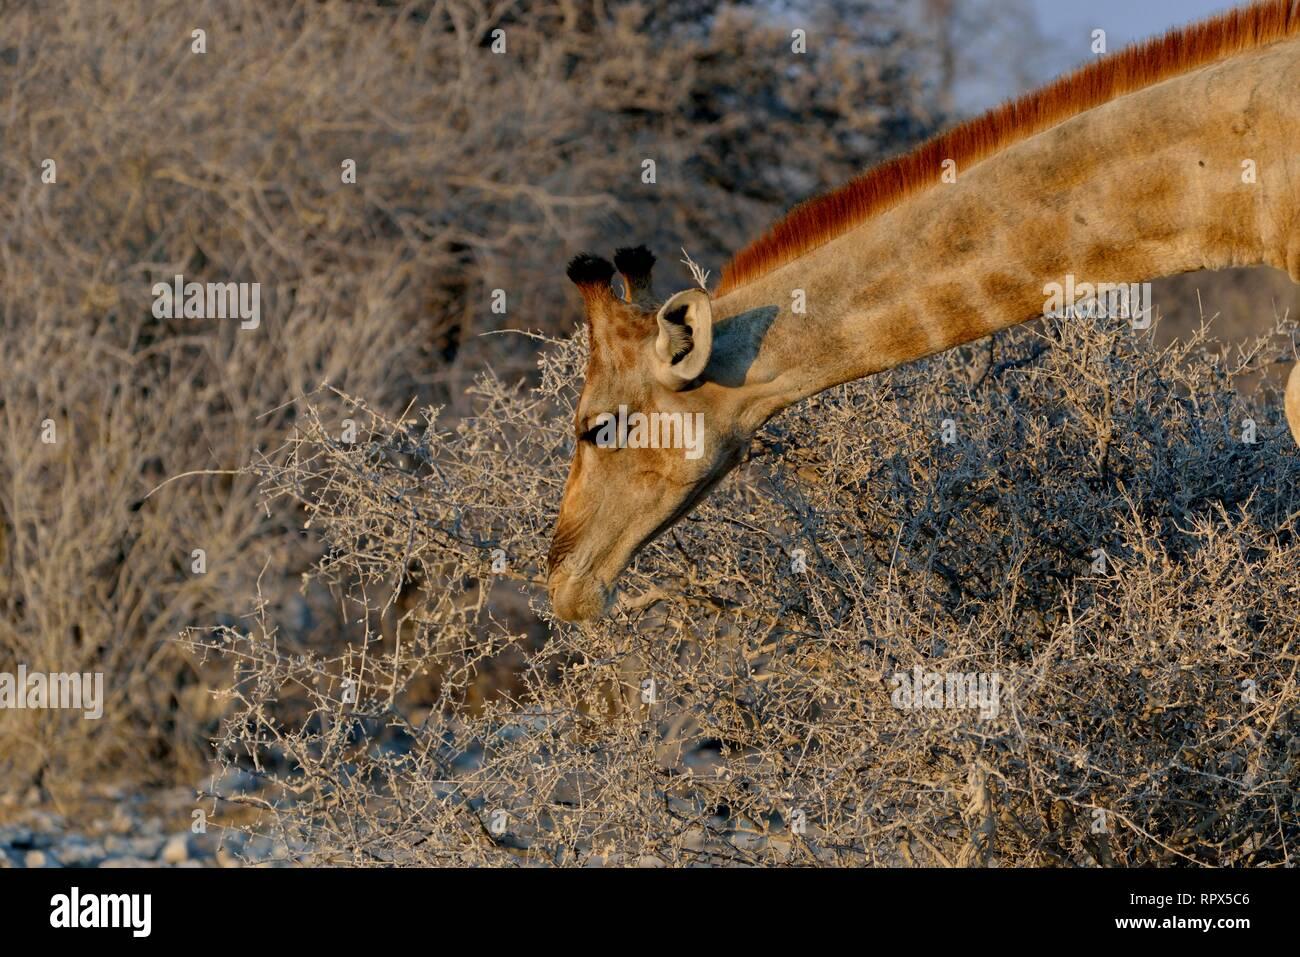 zoology, mammal (mammalia), giraffe (Giraffa camelopardalis), Etosha National Park, Namibia, Africa, Additional-Rights-Clearance-Info-Not-Available - Stock Image